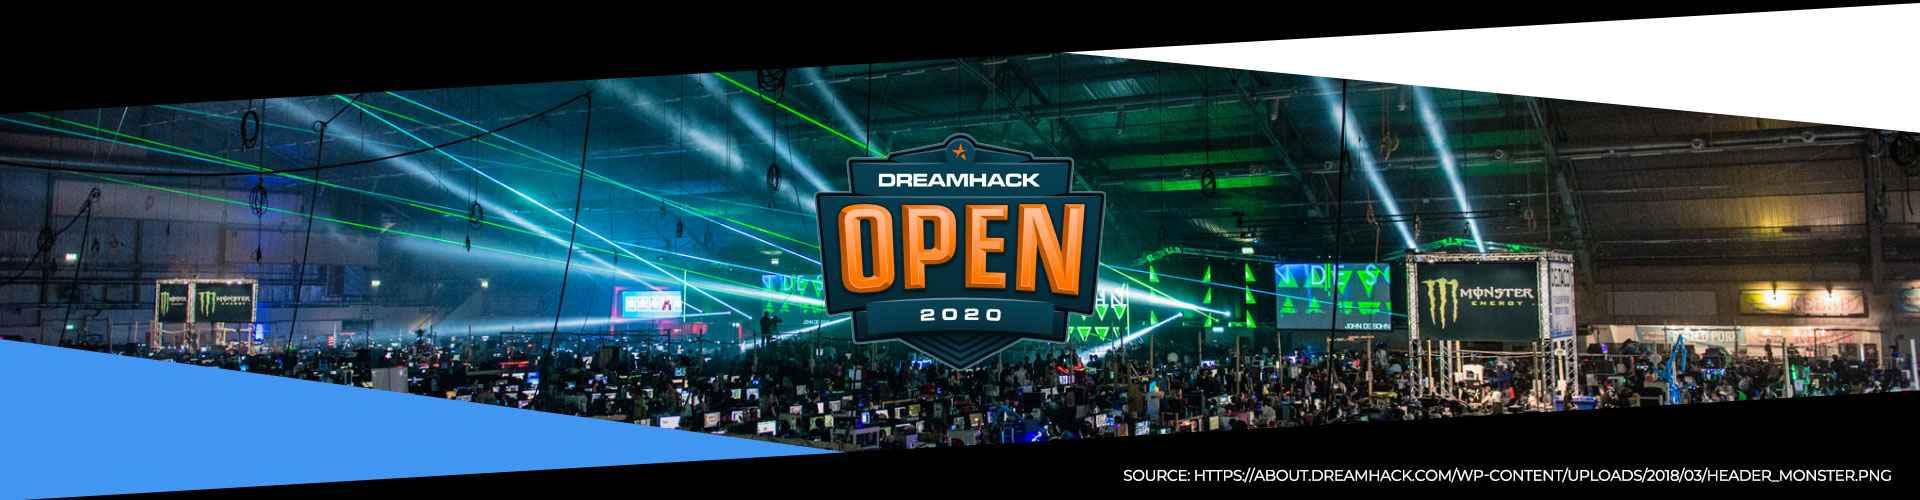 Dreamhack Open Leipzig 2020